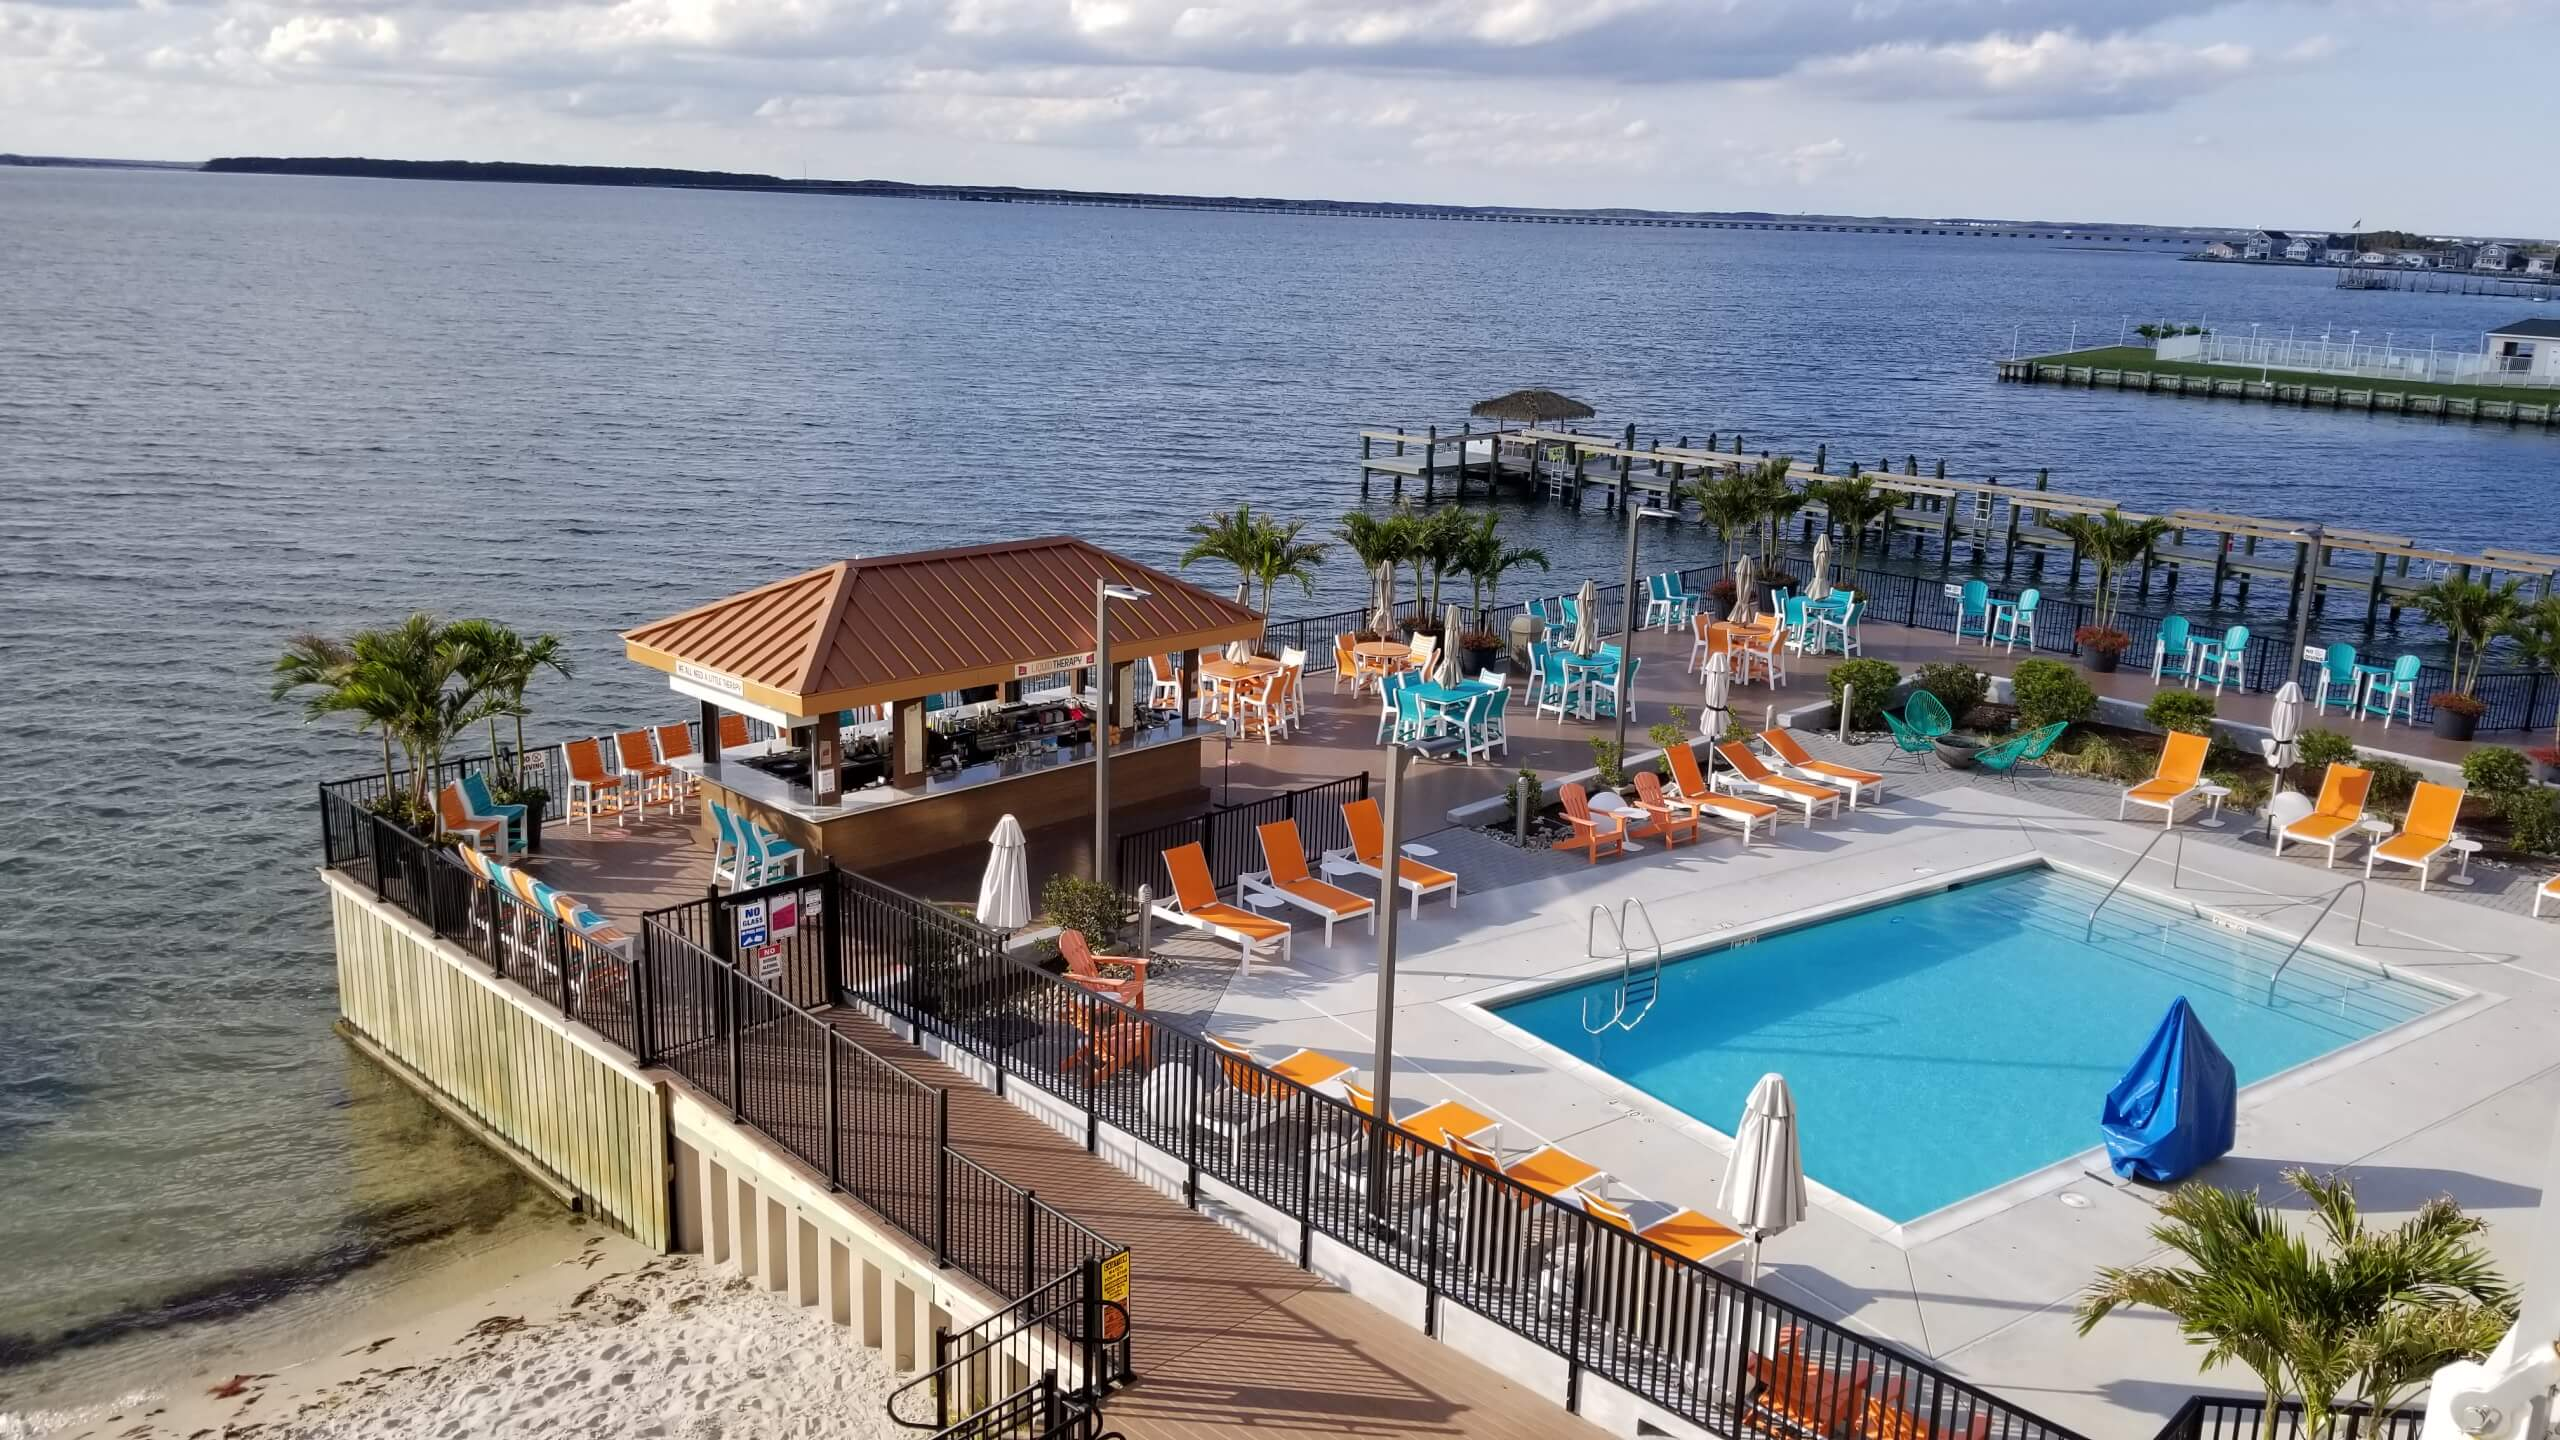 Ocean City Aloft Pool, Bar, and Bay View